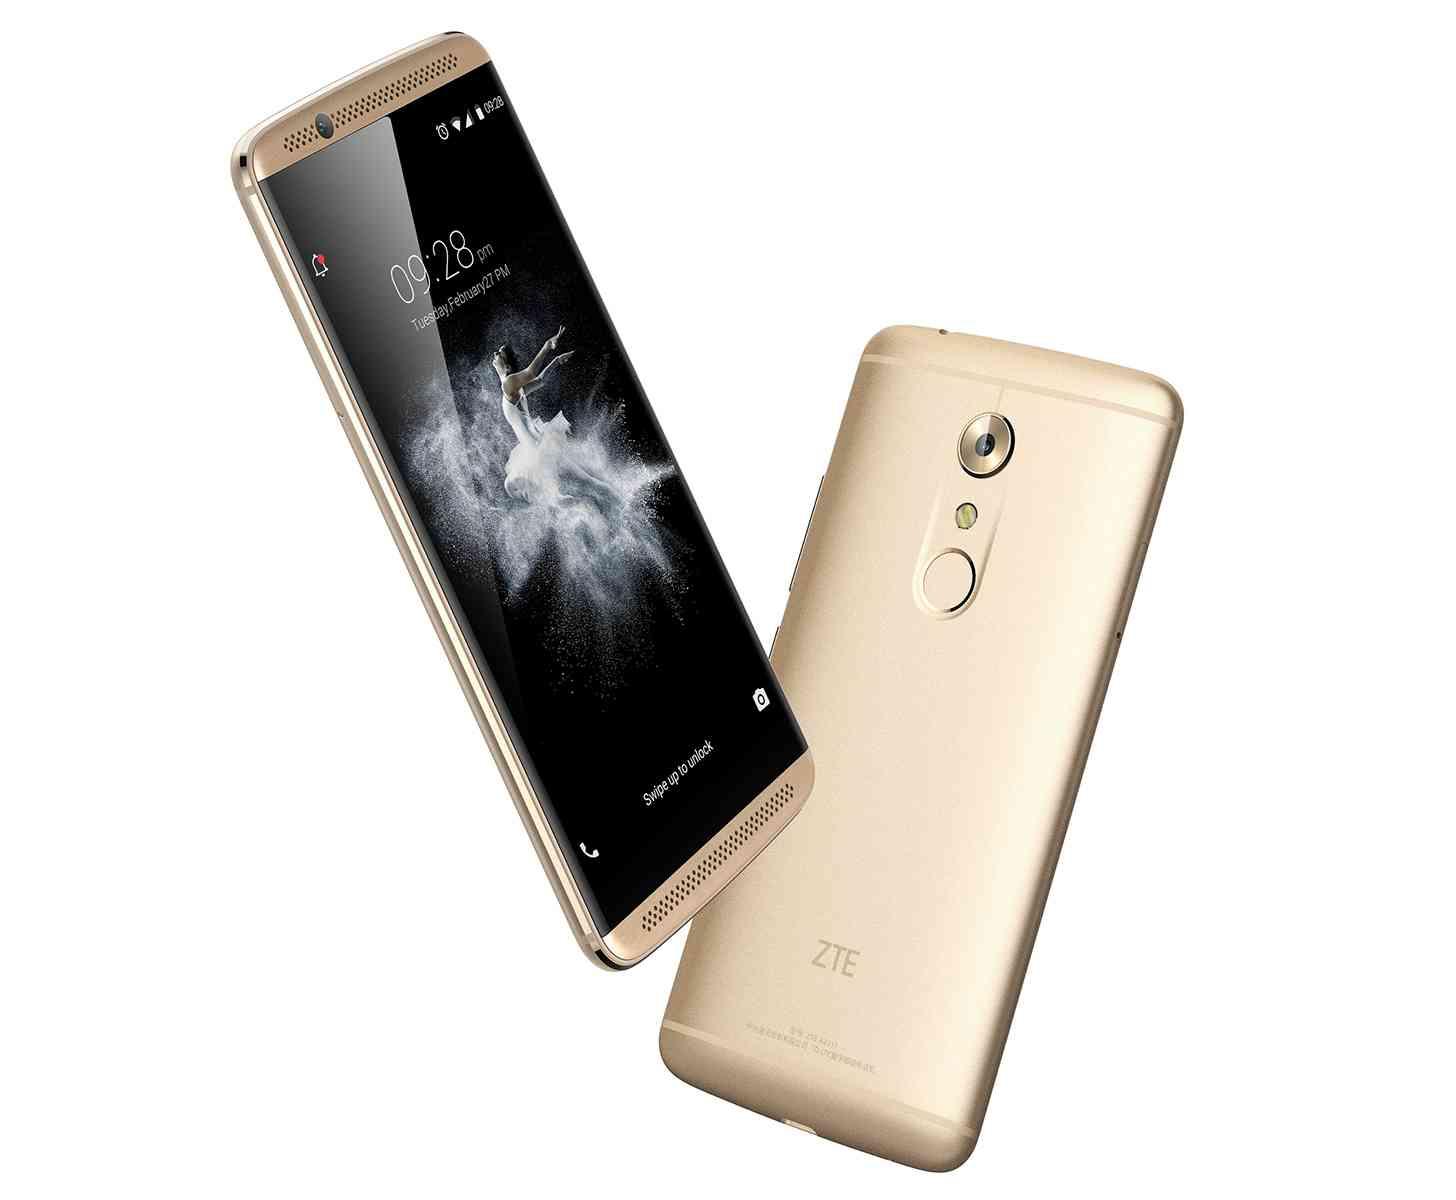 Zte axon 7 to get near stock android oreo update beta program zte axon 7 gold biocorpaavc Choice Image